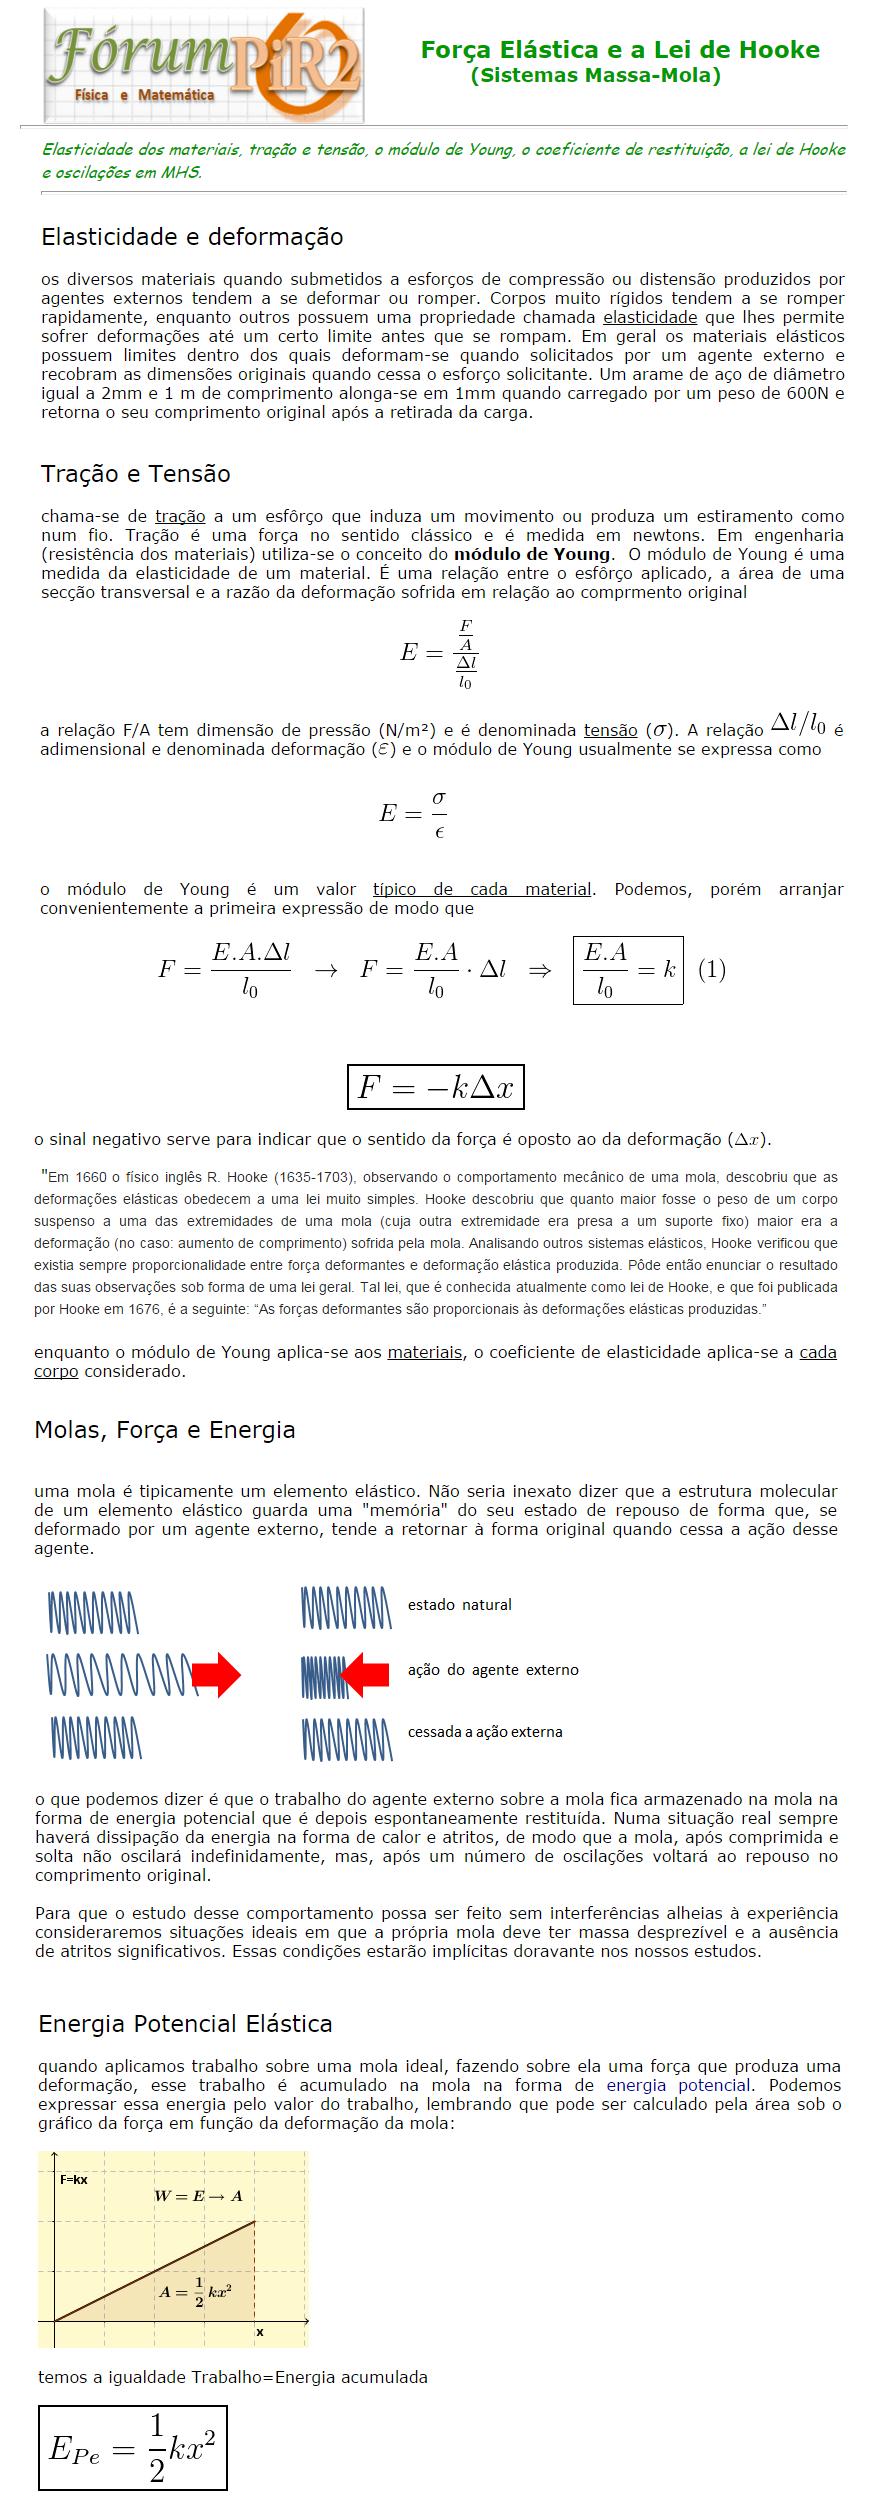 Força Elástica e a Lei de Hooke (Sistemas Massa-Mola) Molas_1